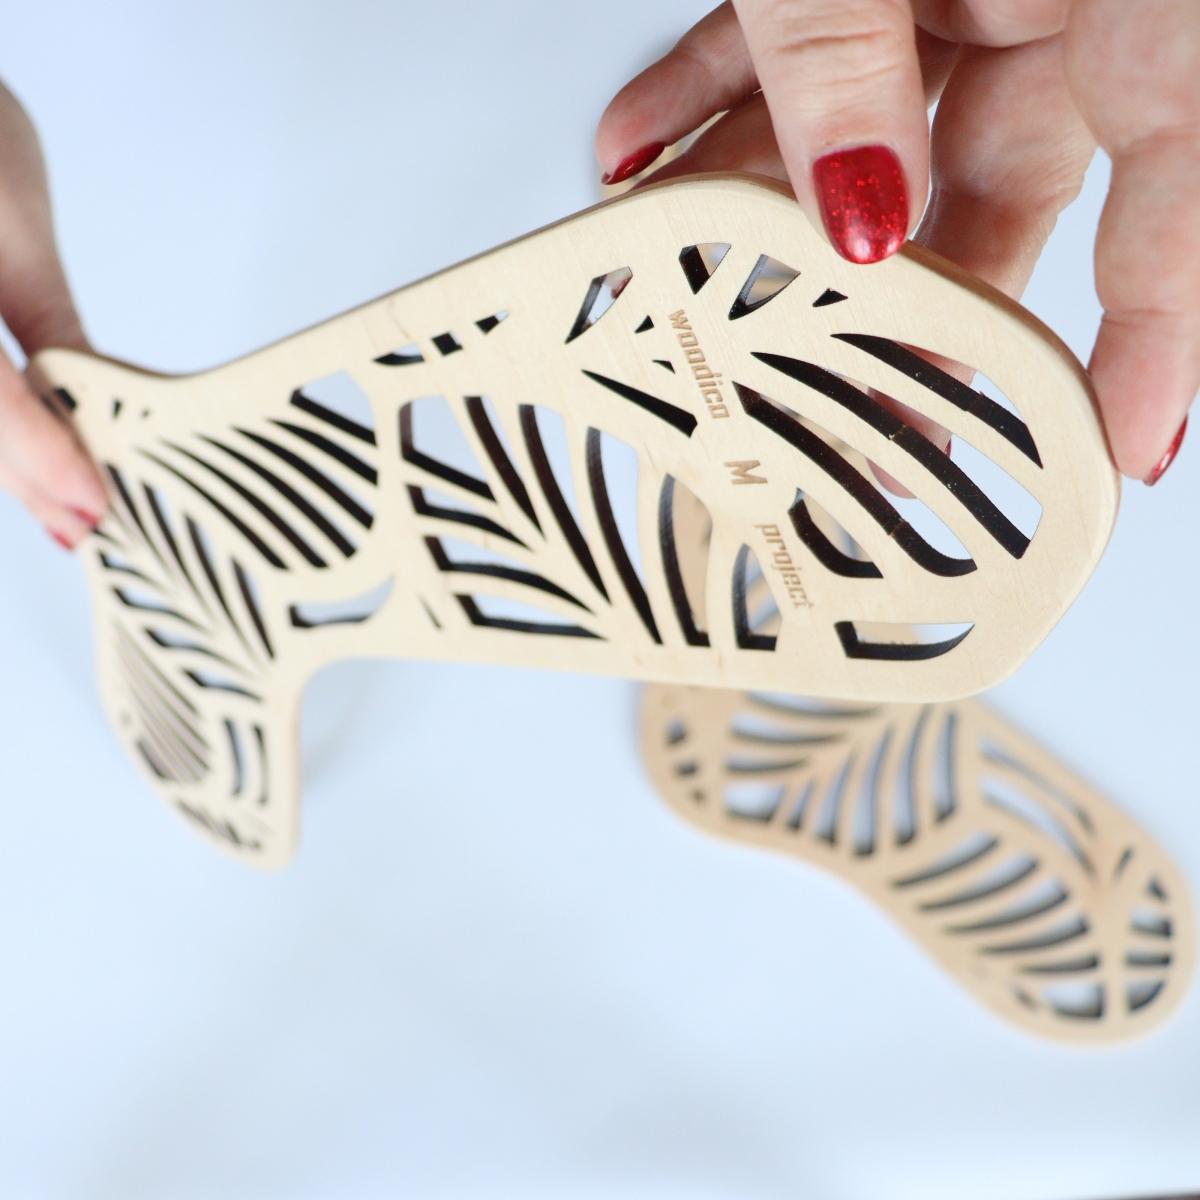 woodico.pro wooden sock blockers monstera 3 1200x1200 - Wooden sock blockers / Monstera